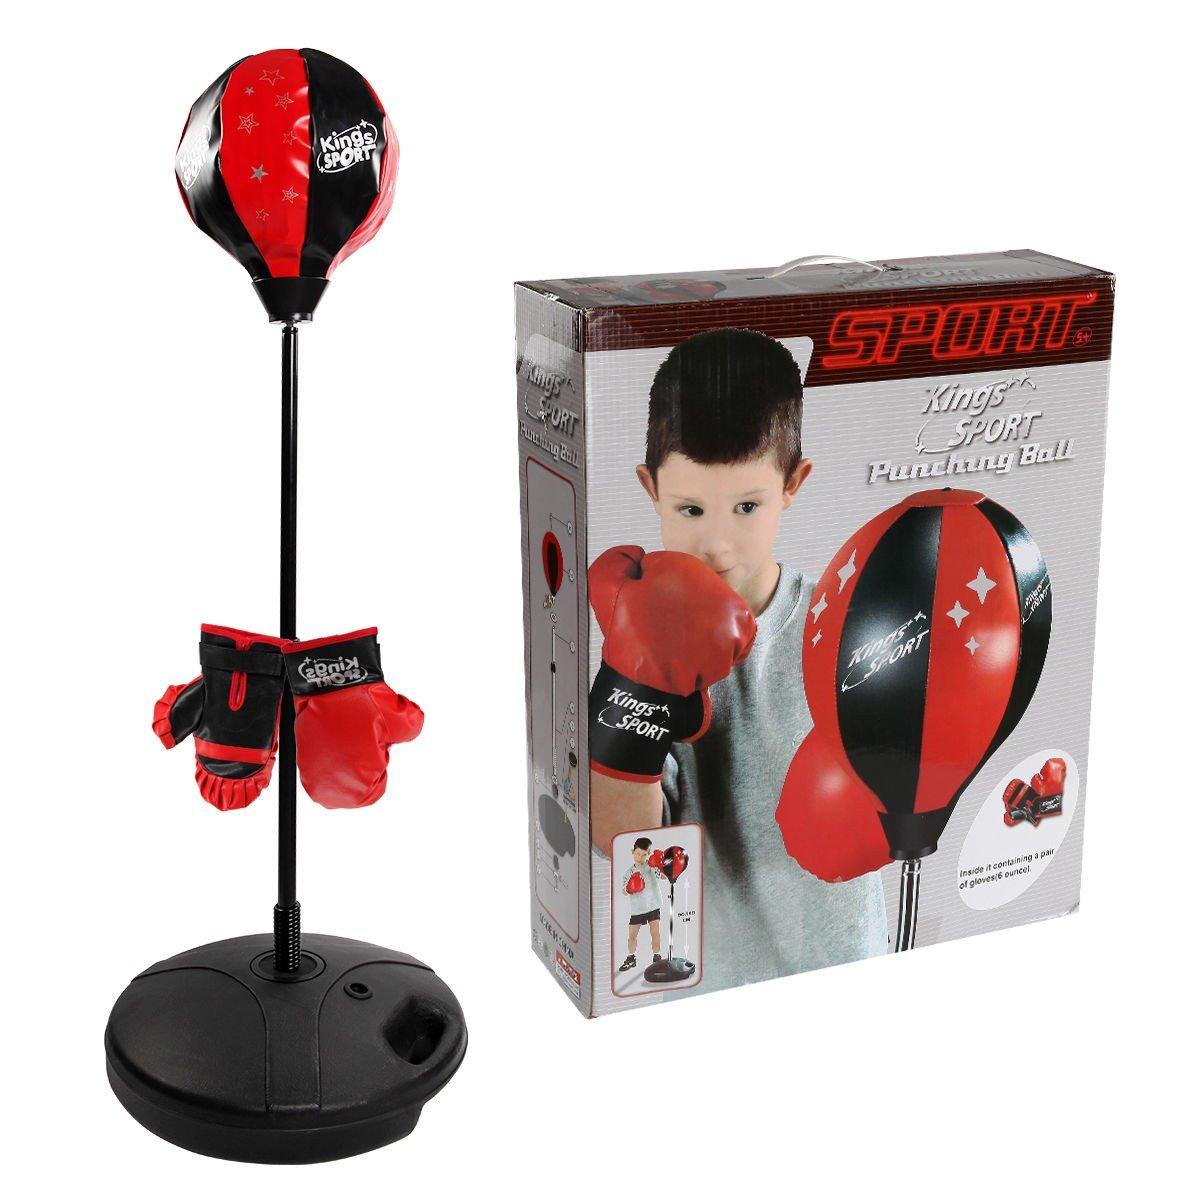 Kids Punching Punching Bagおもちゃセット調節可能なスタンドボクシンググローブSpeed by Ball – by Choice製品 – B074J7YLD8, 着物 卸直営店 京都マルヒサ:ebd5ba88 --- capela.dominiotemporario.com